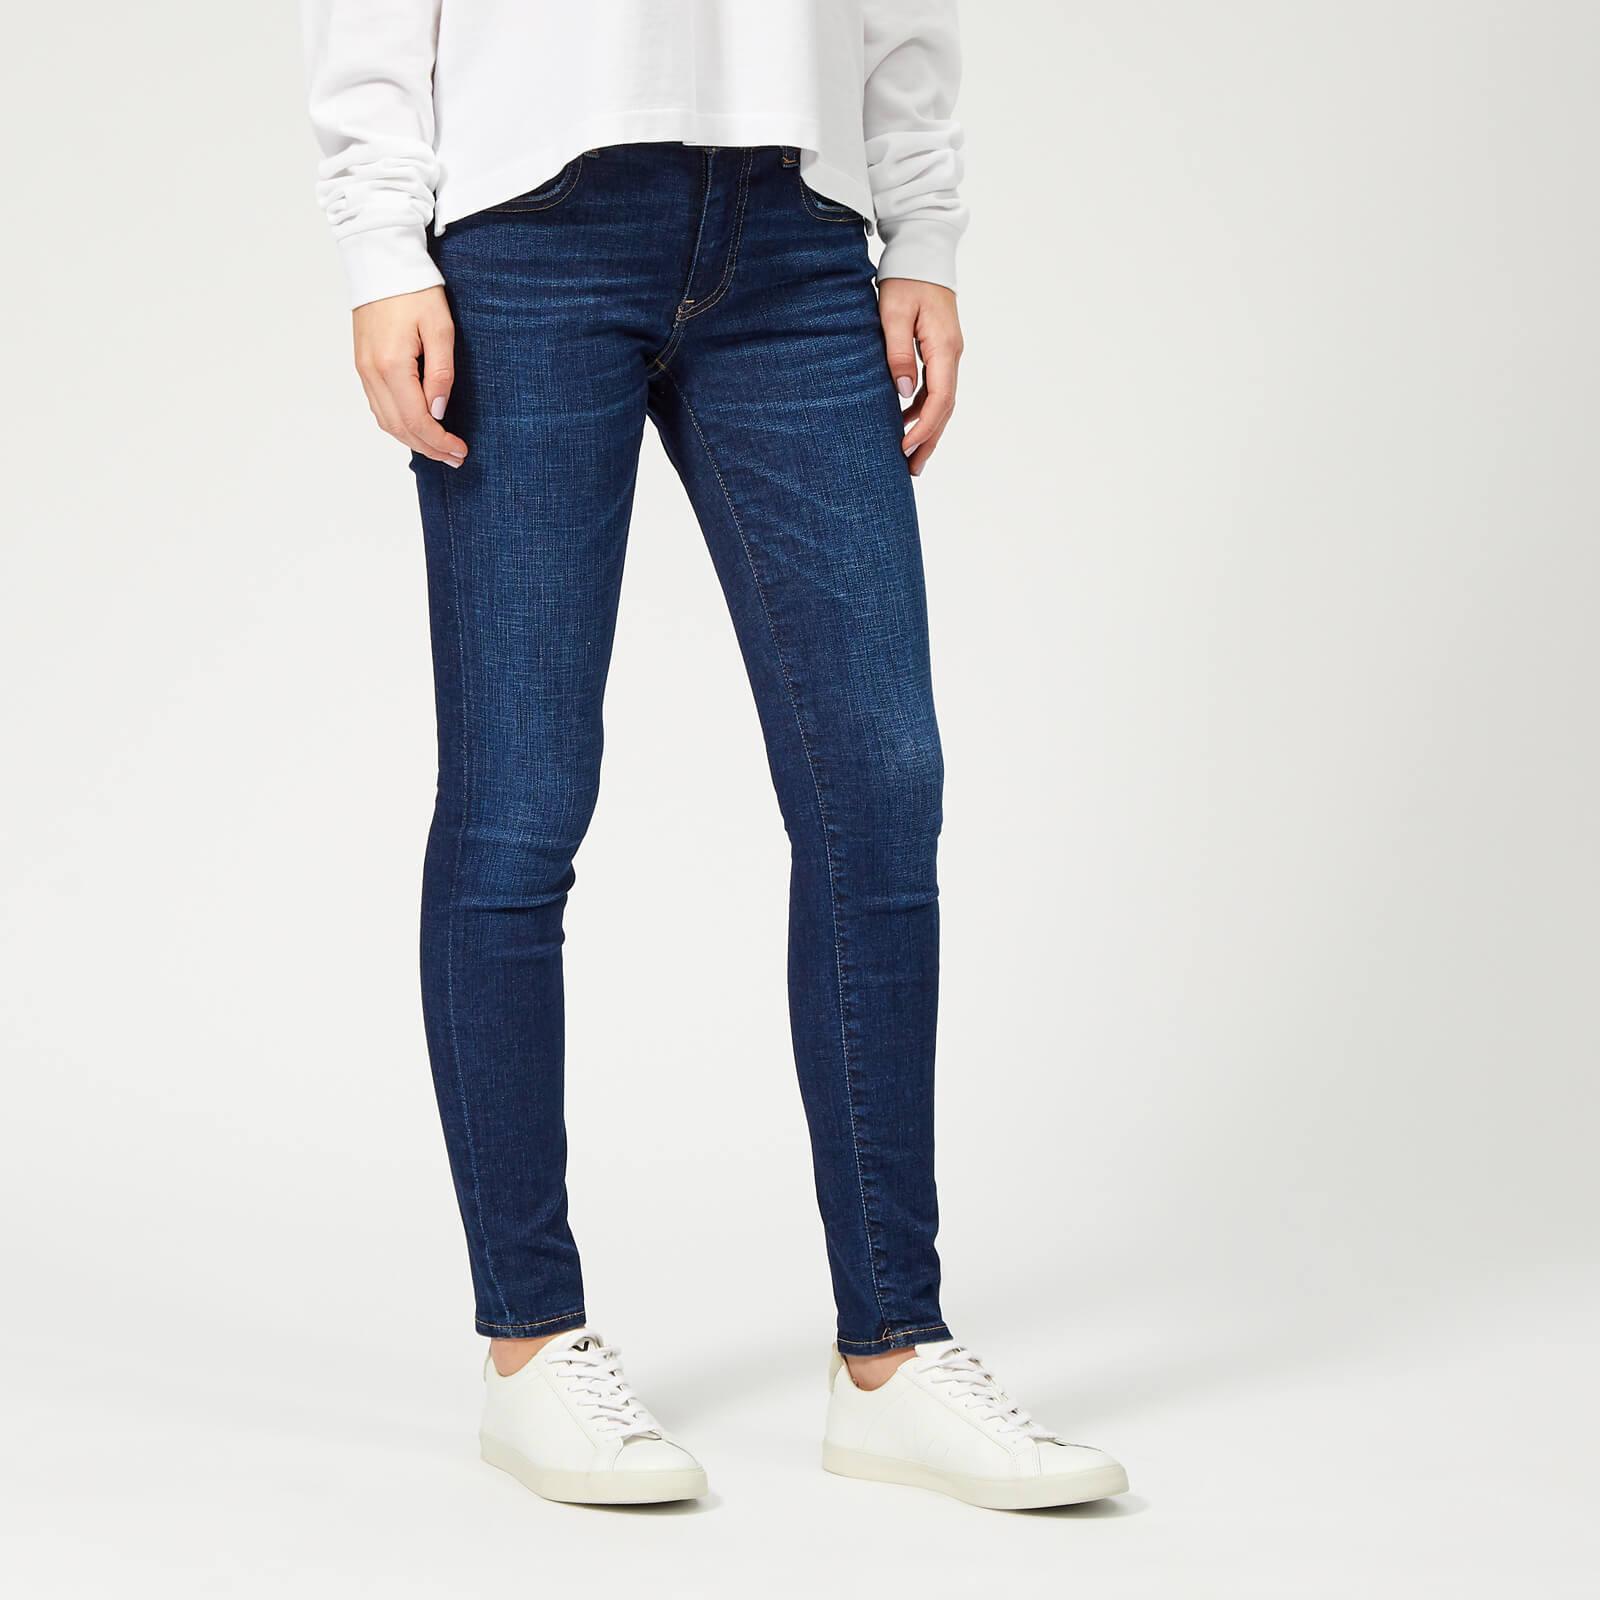 96ec683d31d9 Polo Ralph Lauren Women s Super Skinny Denim Jeans - Blue - Free UK  Delivery over £50